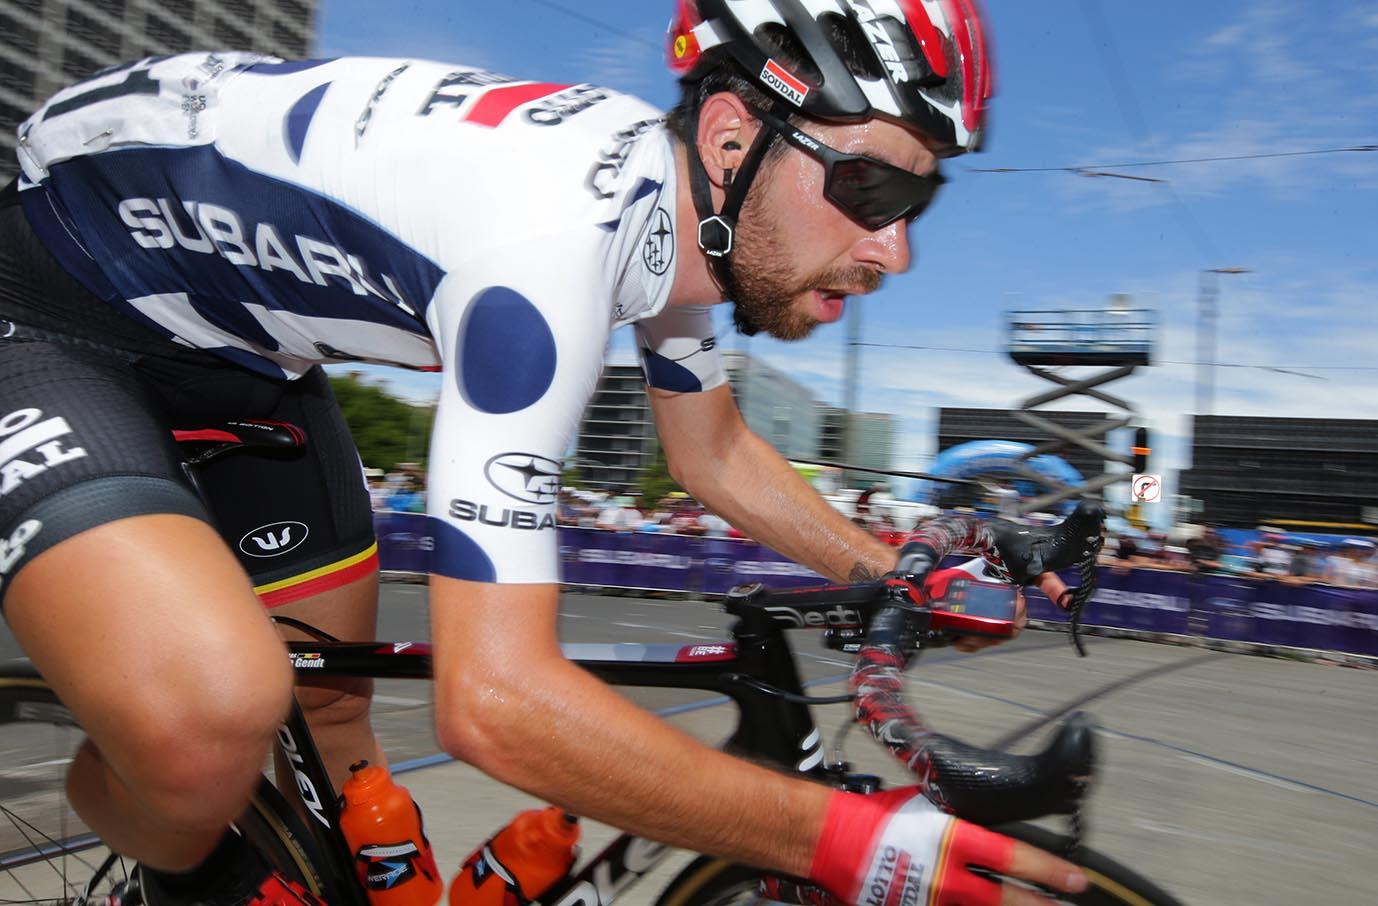 Subaru King of the Mountain winner Thomas De Gent (Lotto-Soudal)